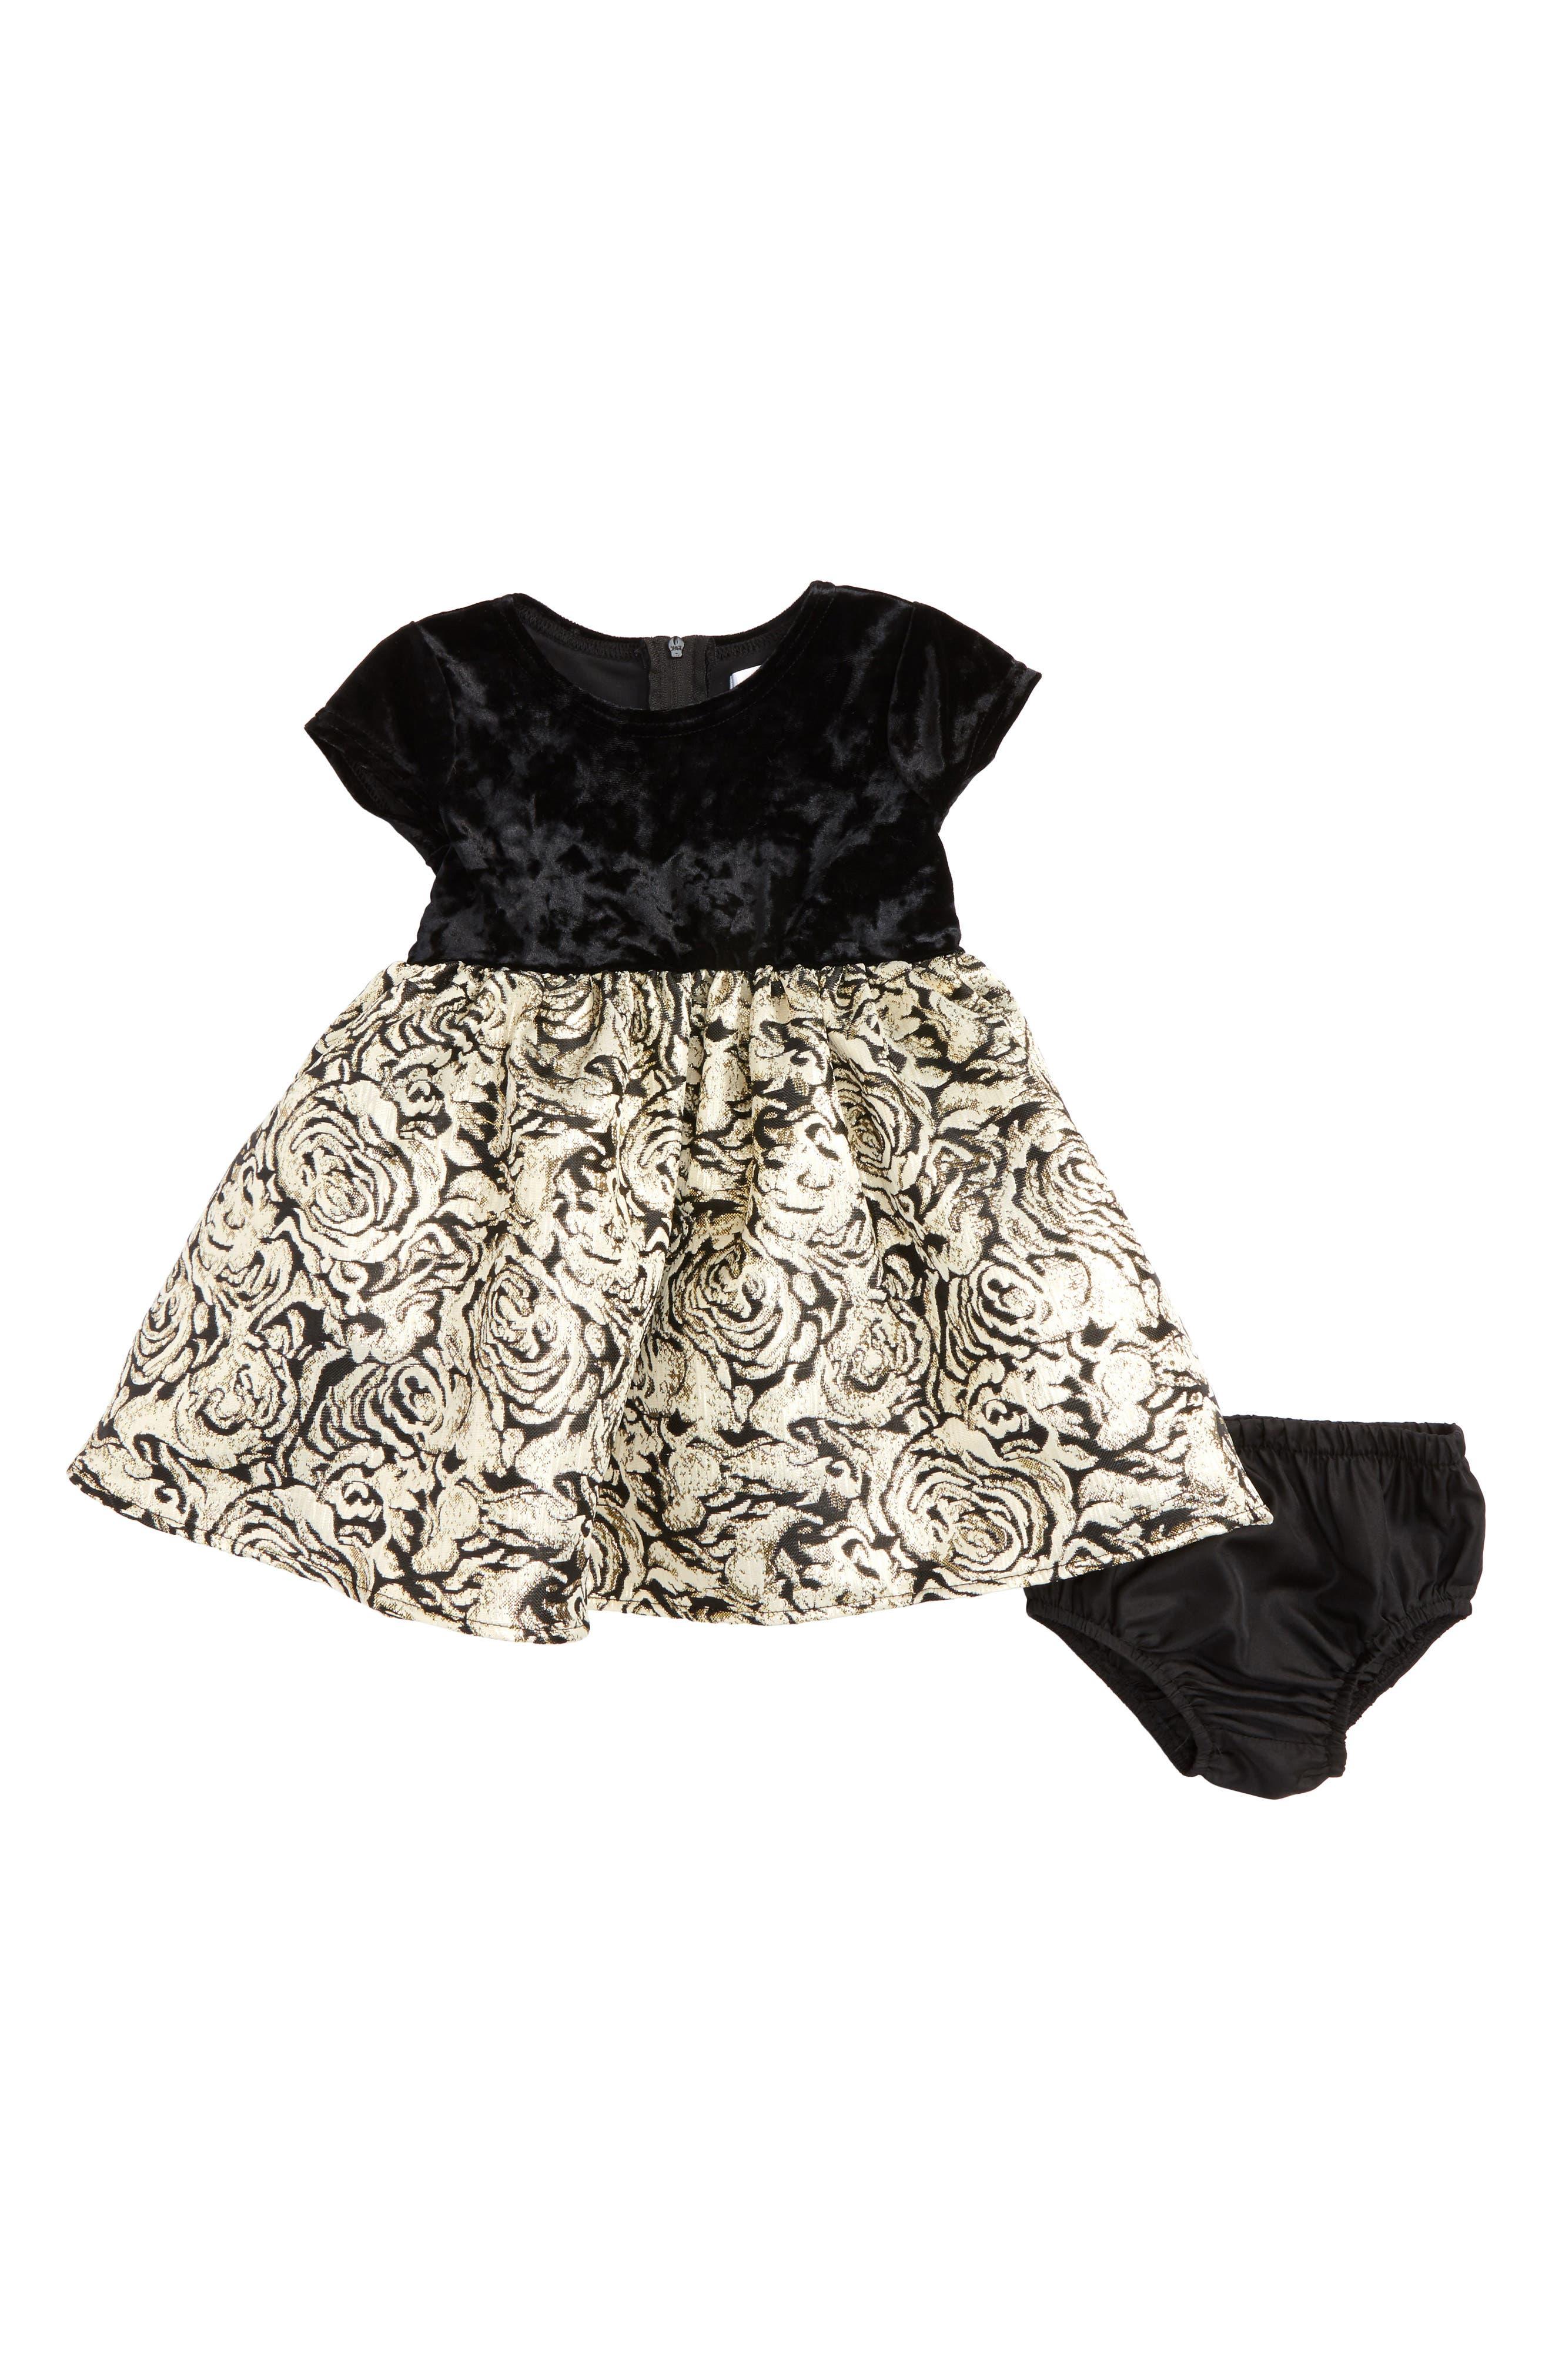 Velvet & Floral Jacquard Dress,                             Main thumbnail 1, color,                             Black/ Gold